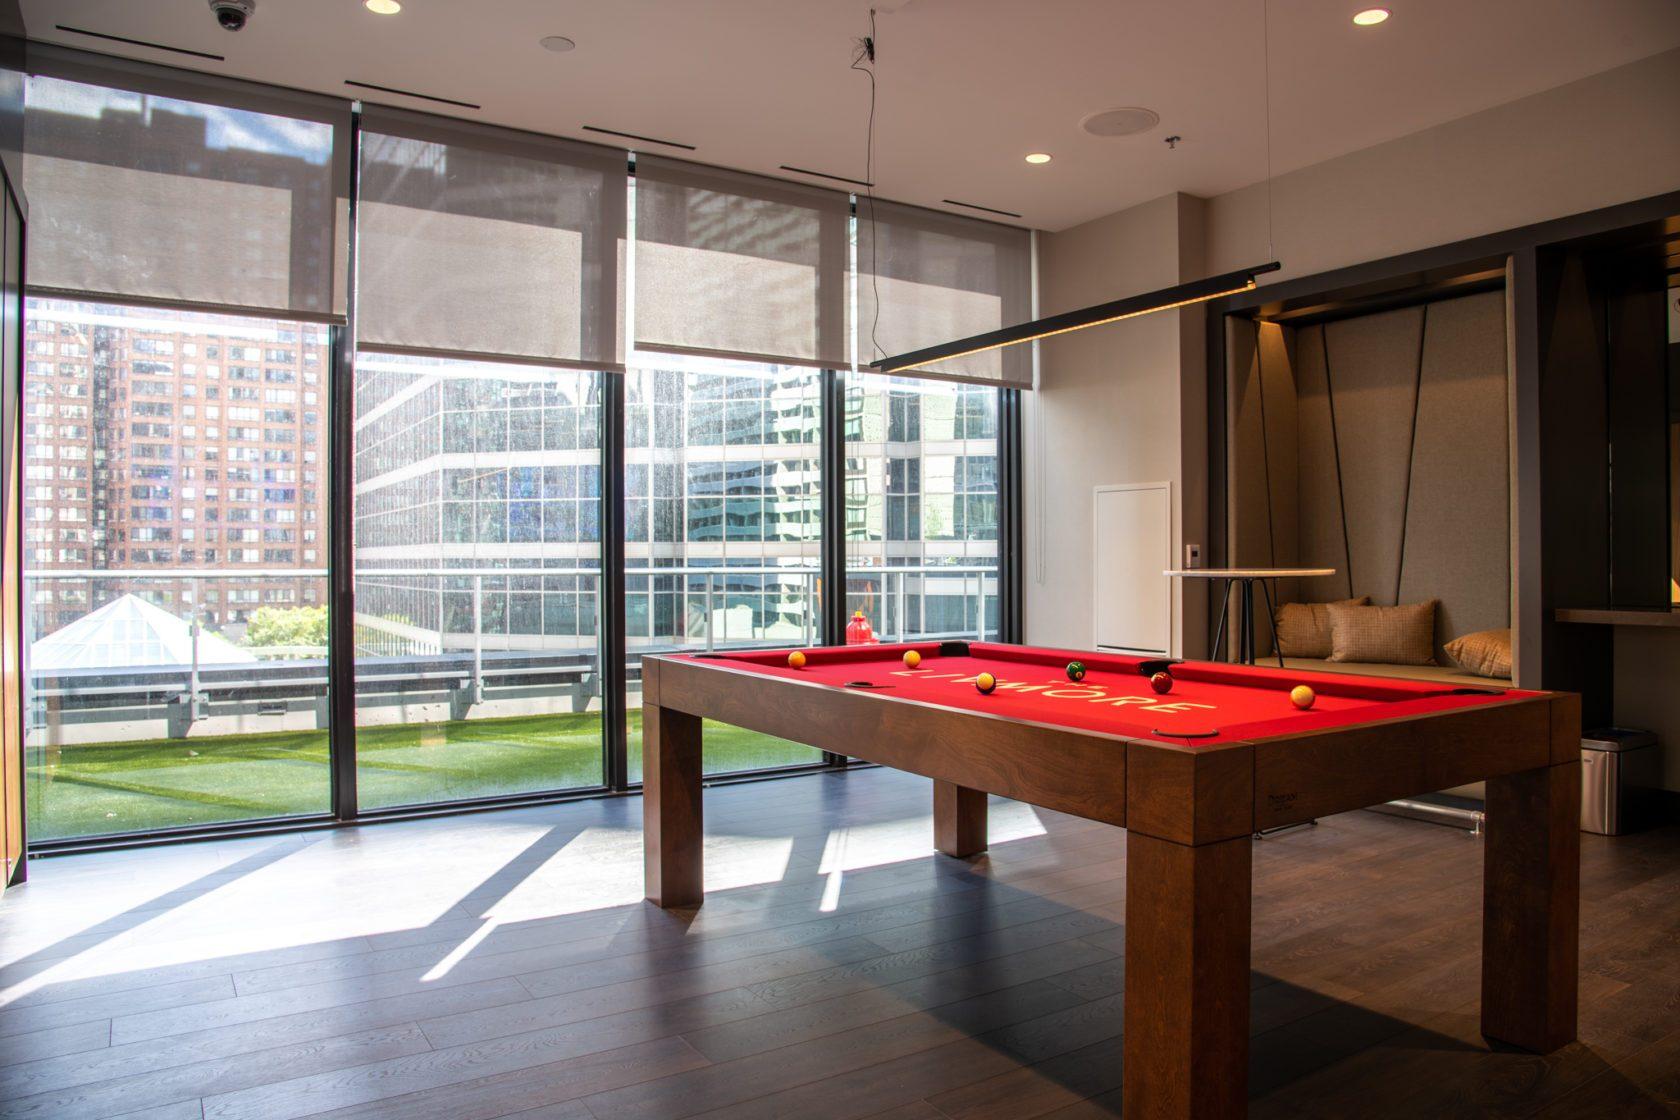 The Livmore amenities - Biliards